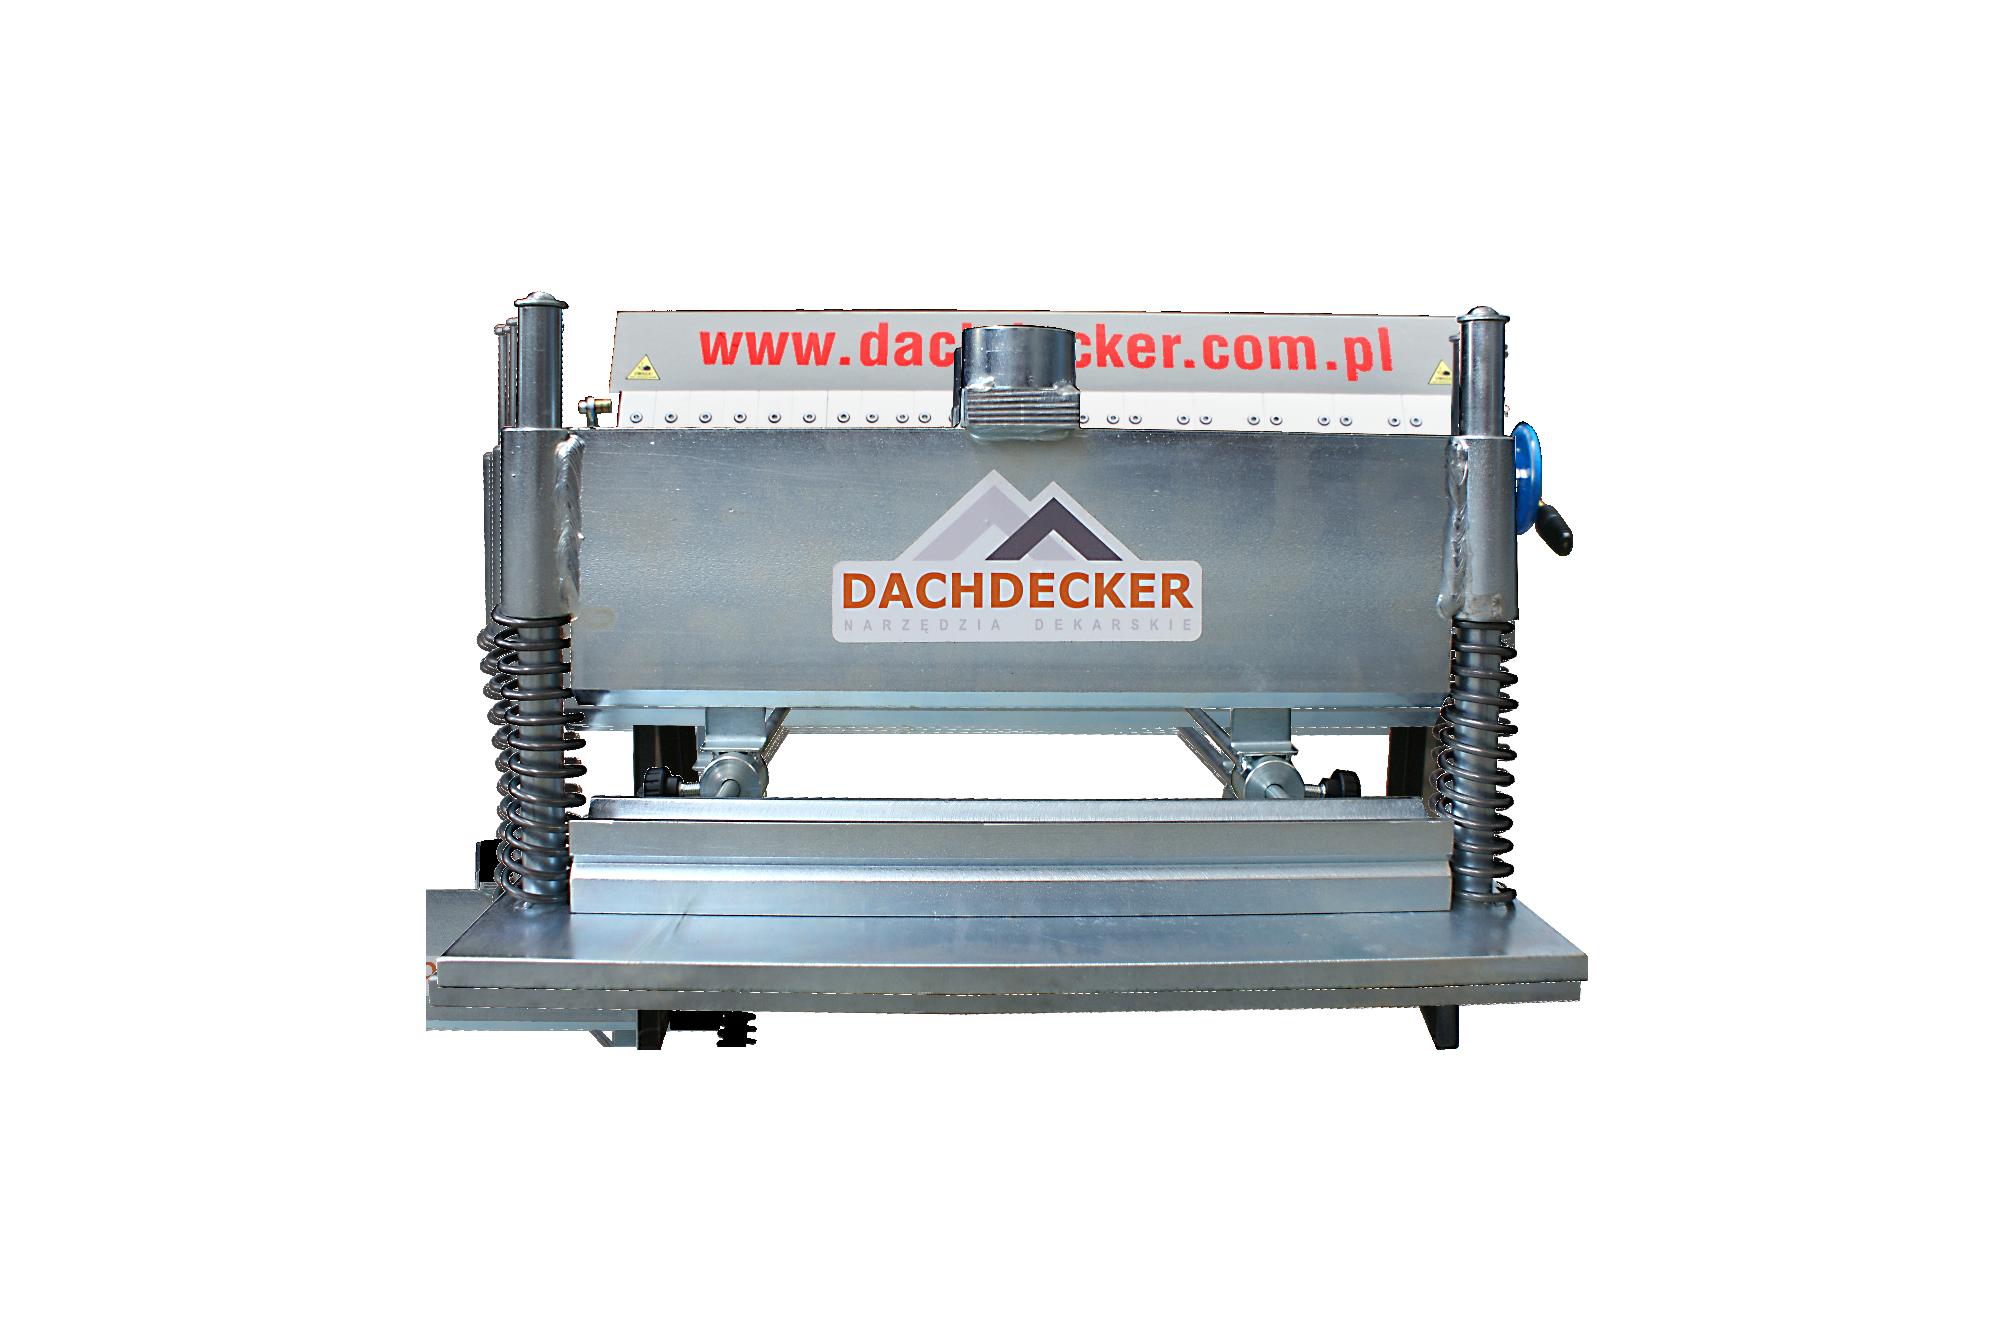 fabrication presse hydraulique maison zoomOUVRIR